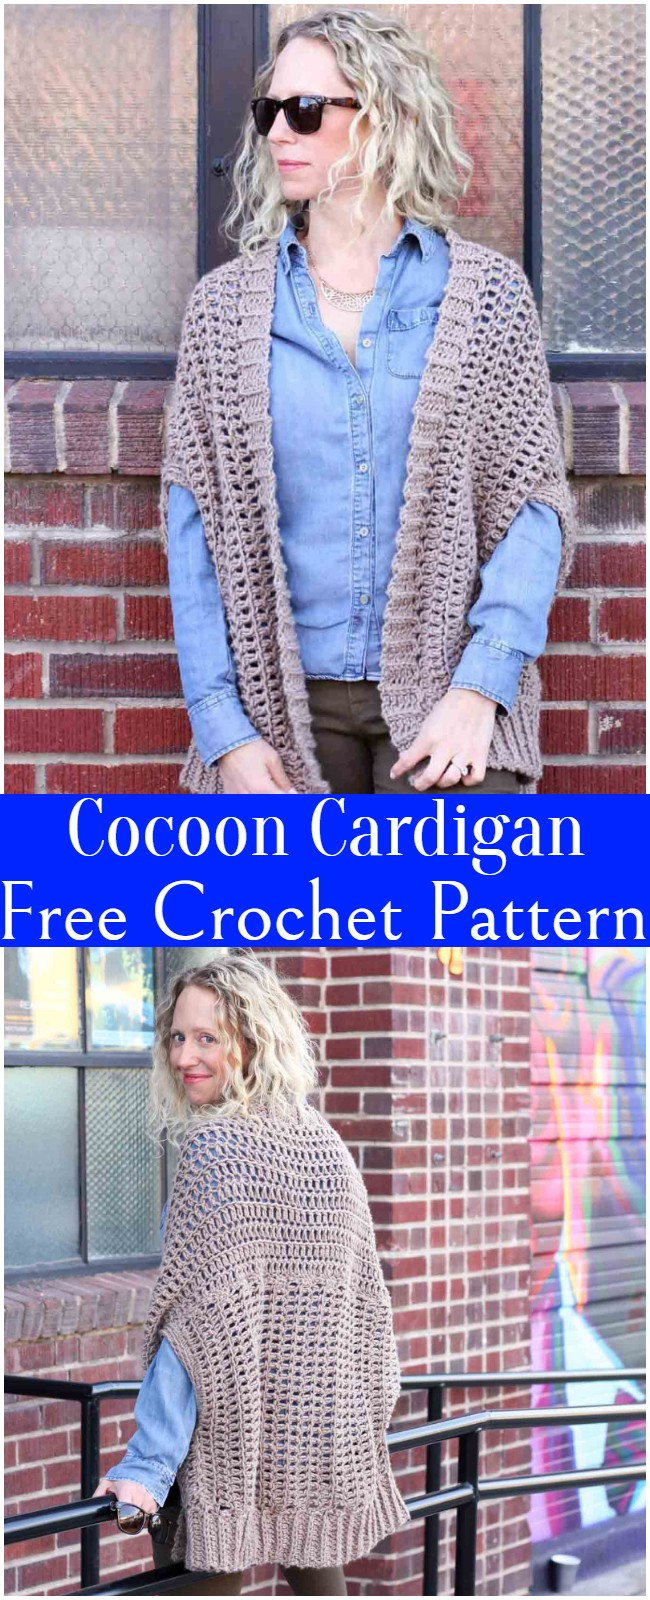 Crochet Cocoon Cardigan Pattern